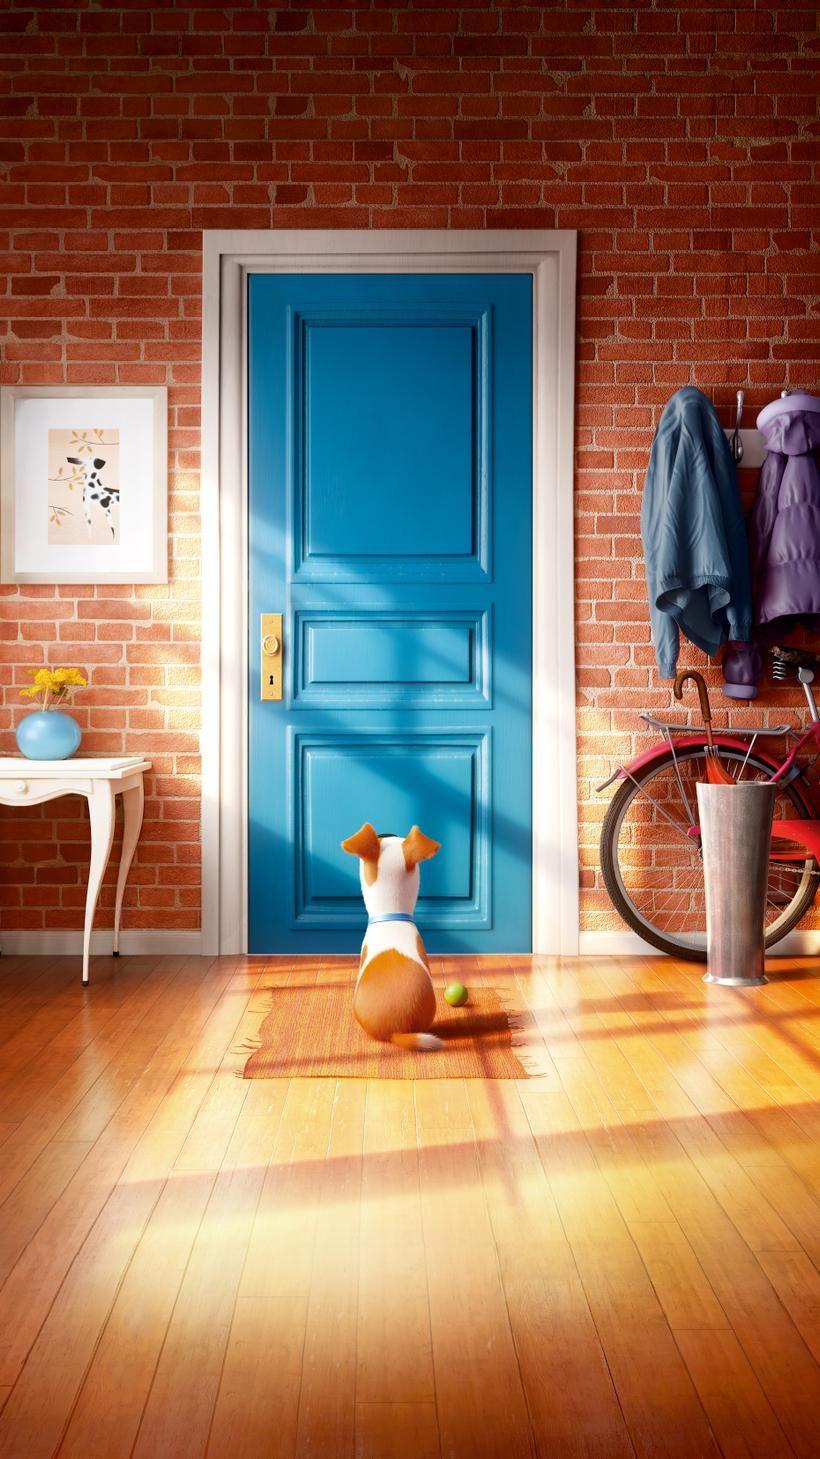 The Secret Life Of Pets 2016 Phone Wallpaper 2020 背景